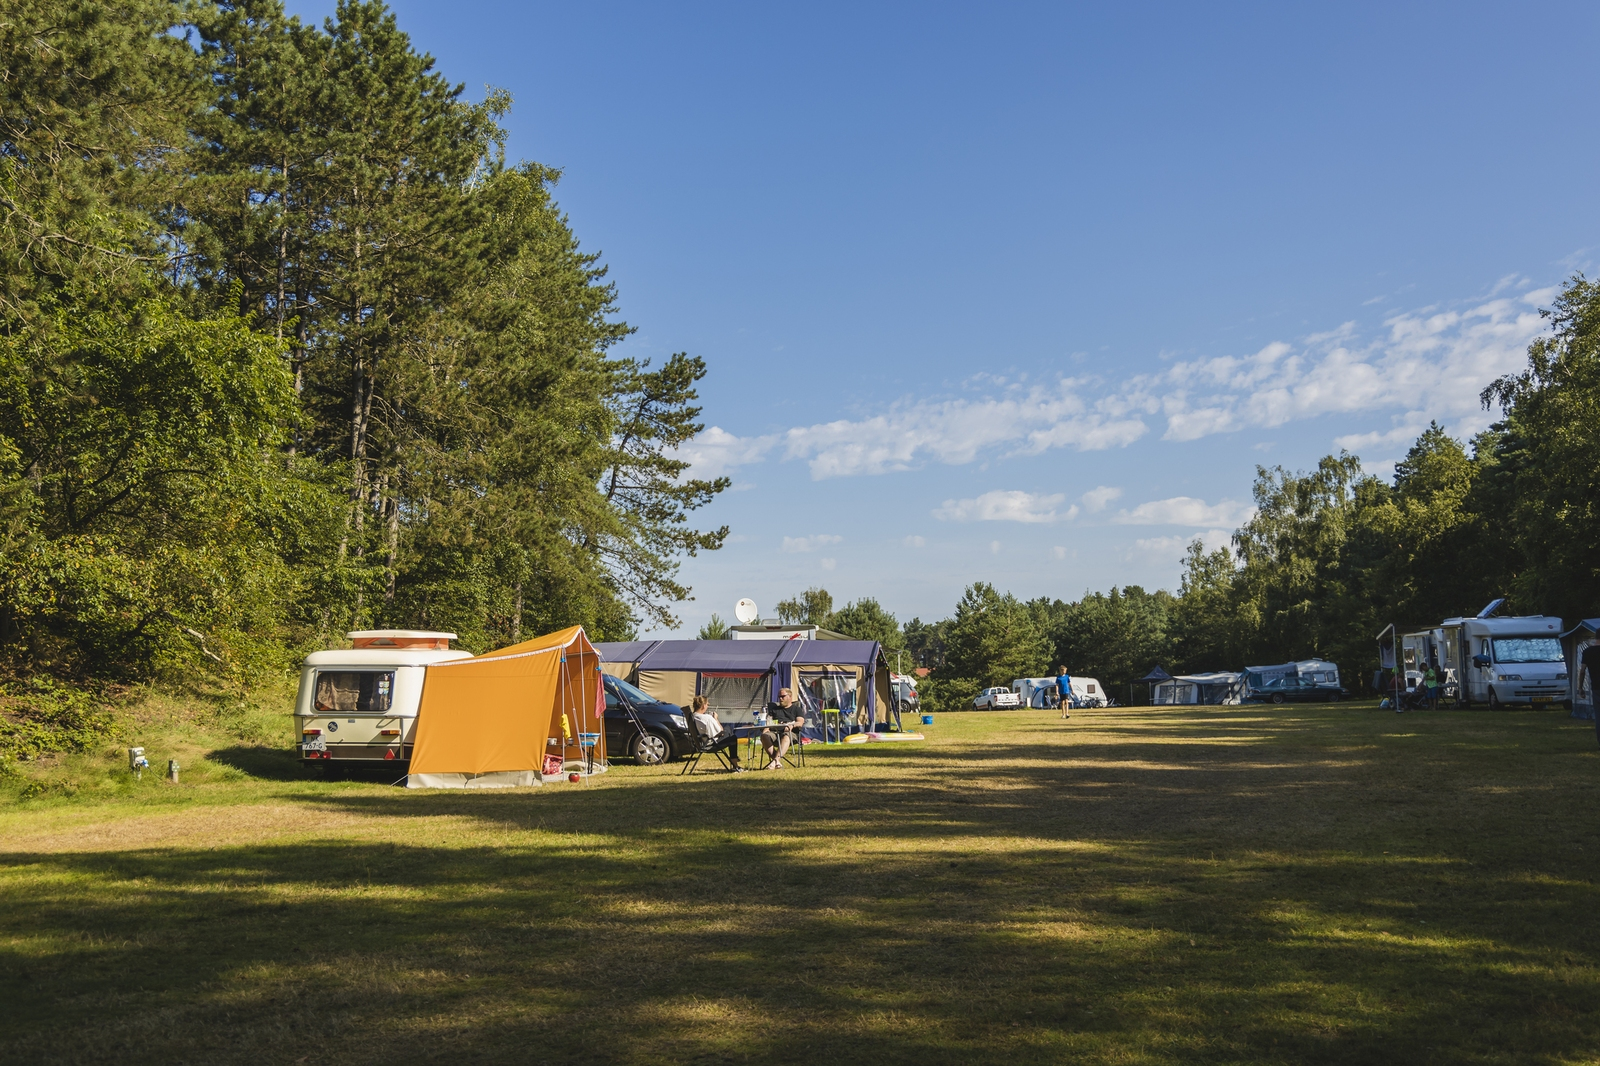 Standard Campingplatz